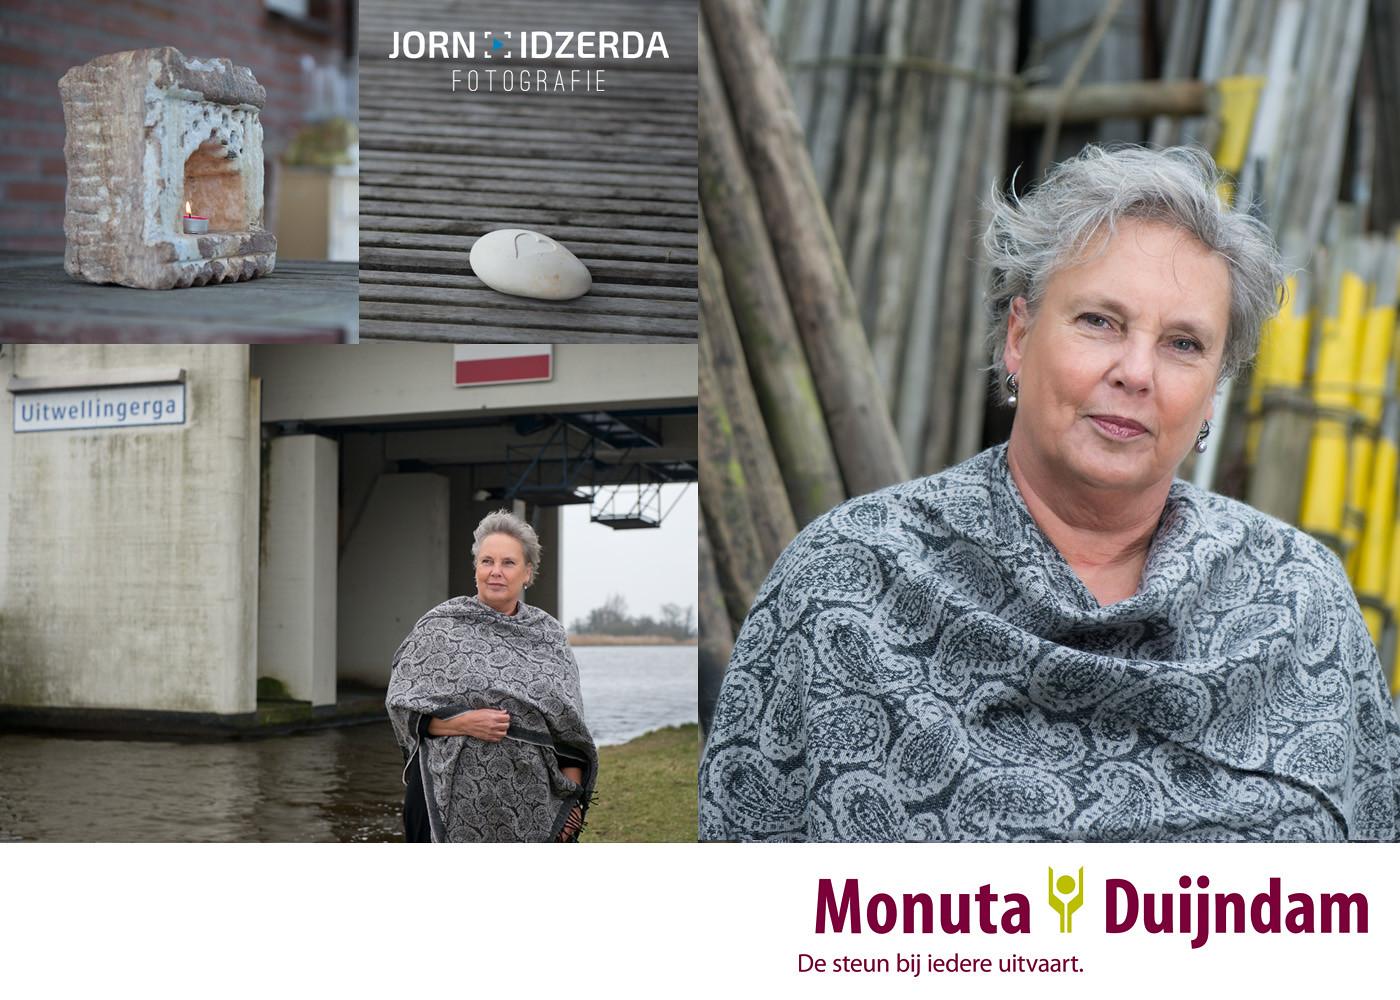 Monuta Duijndam